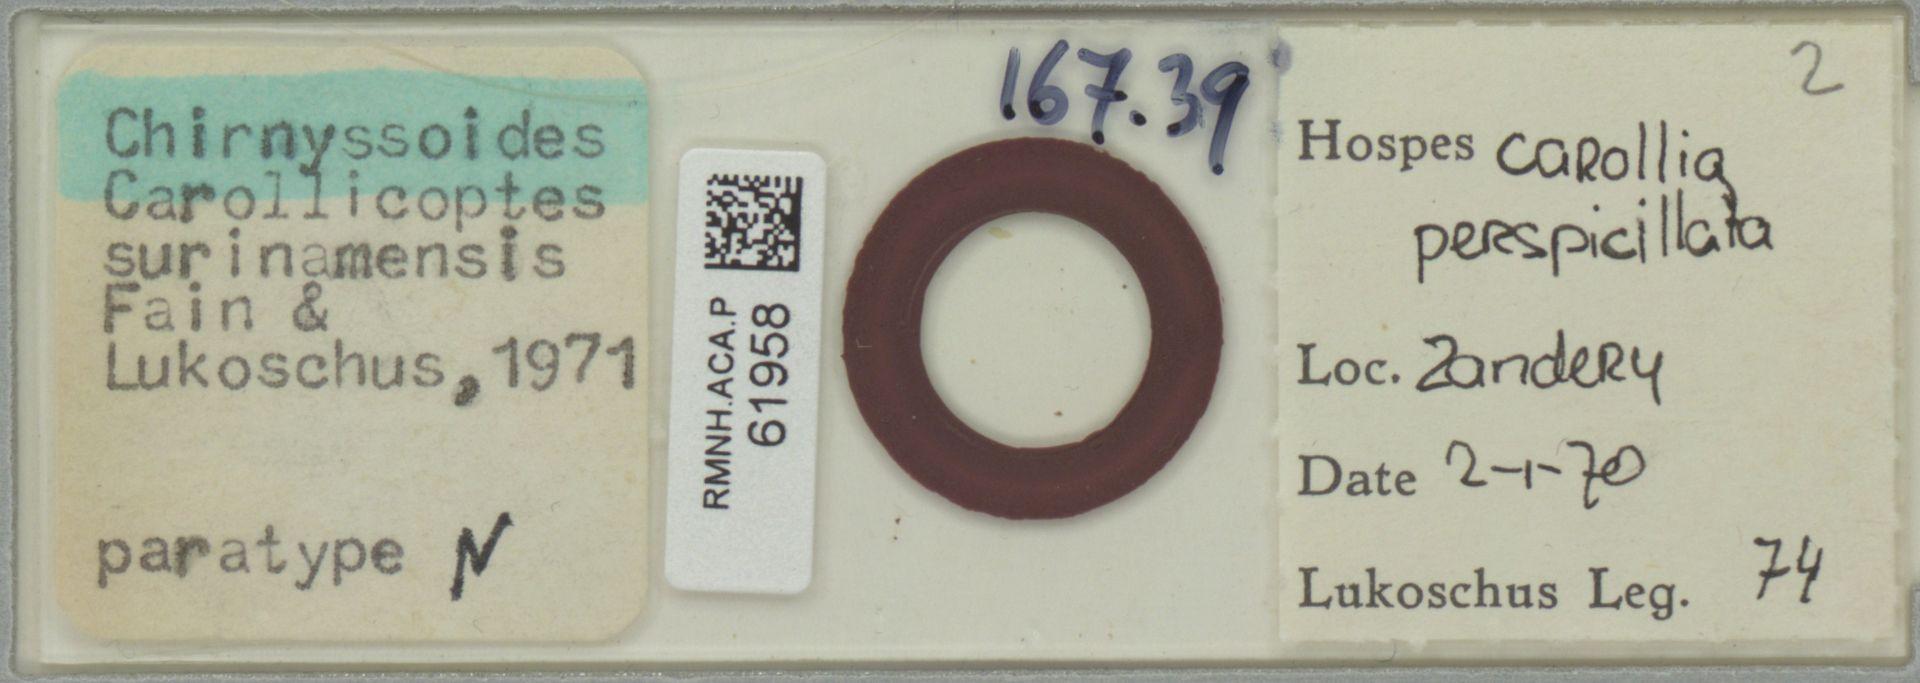 RMNH.ACA.P.61958 | Chirnyssoides (Carollicoptes) surinamensis Fain & Lukoschus, 1971